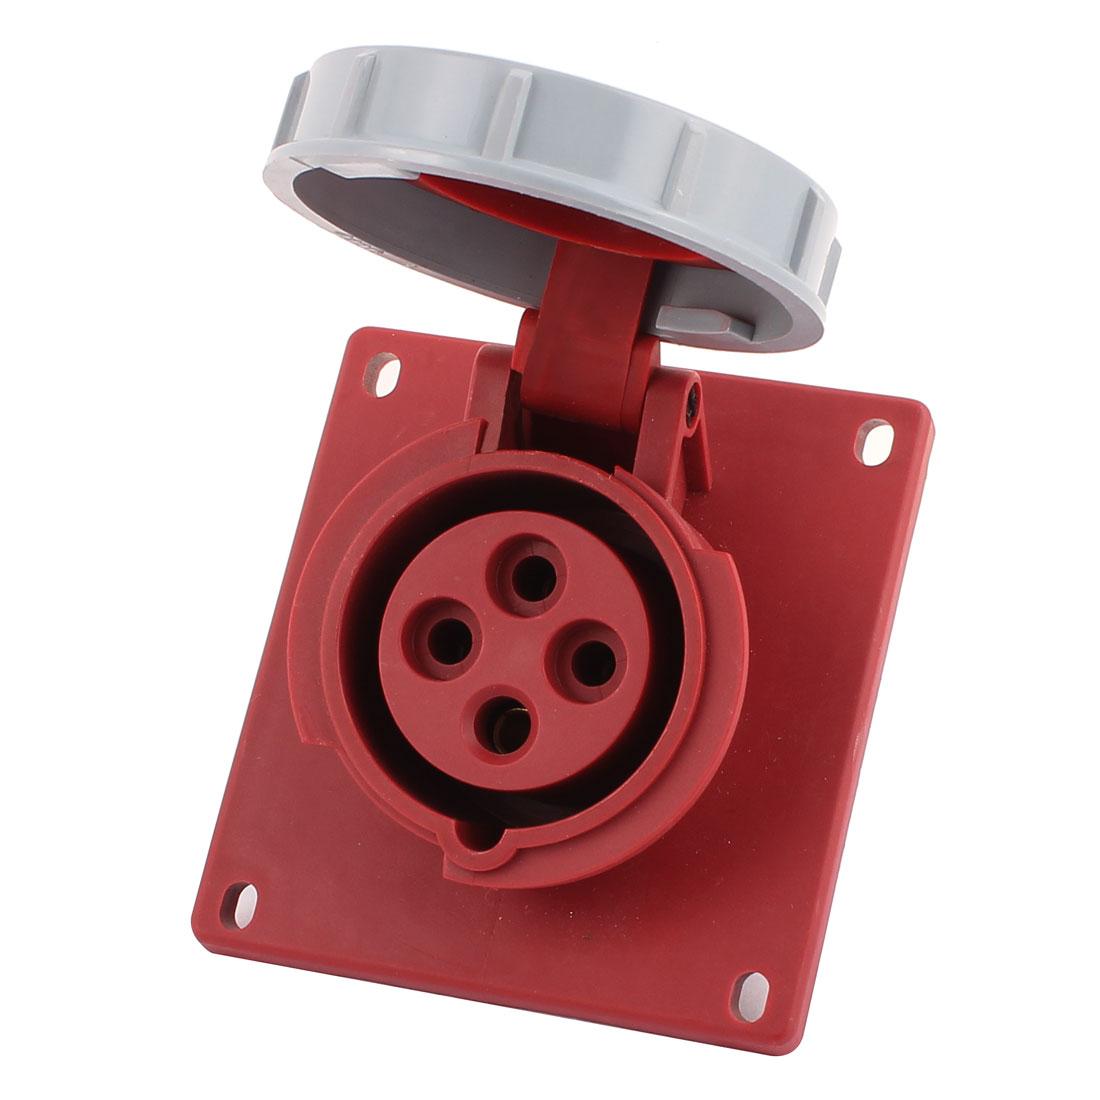 AC 380V-450V 16A IP67 3P+E 4P Female Industrial Consealing Oblique Socket